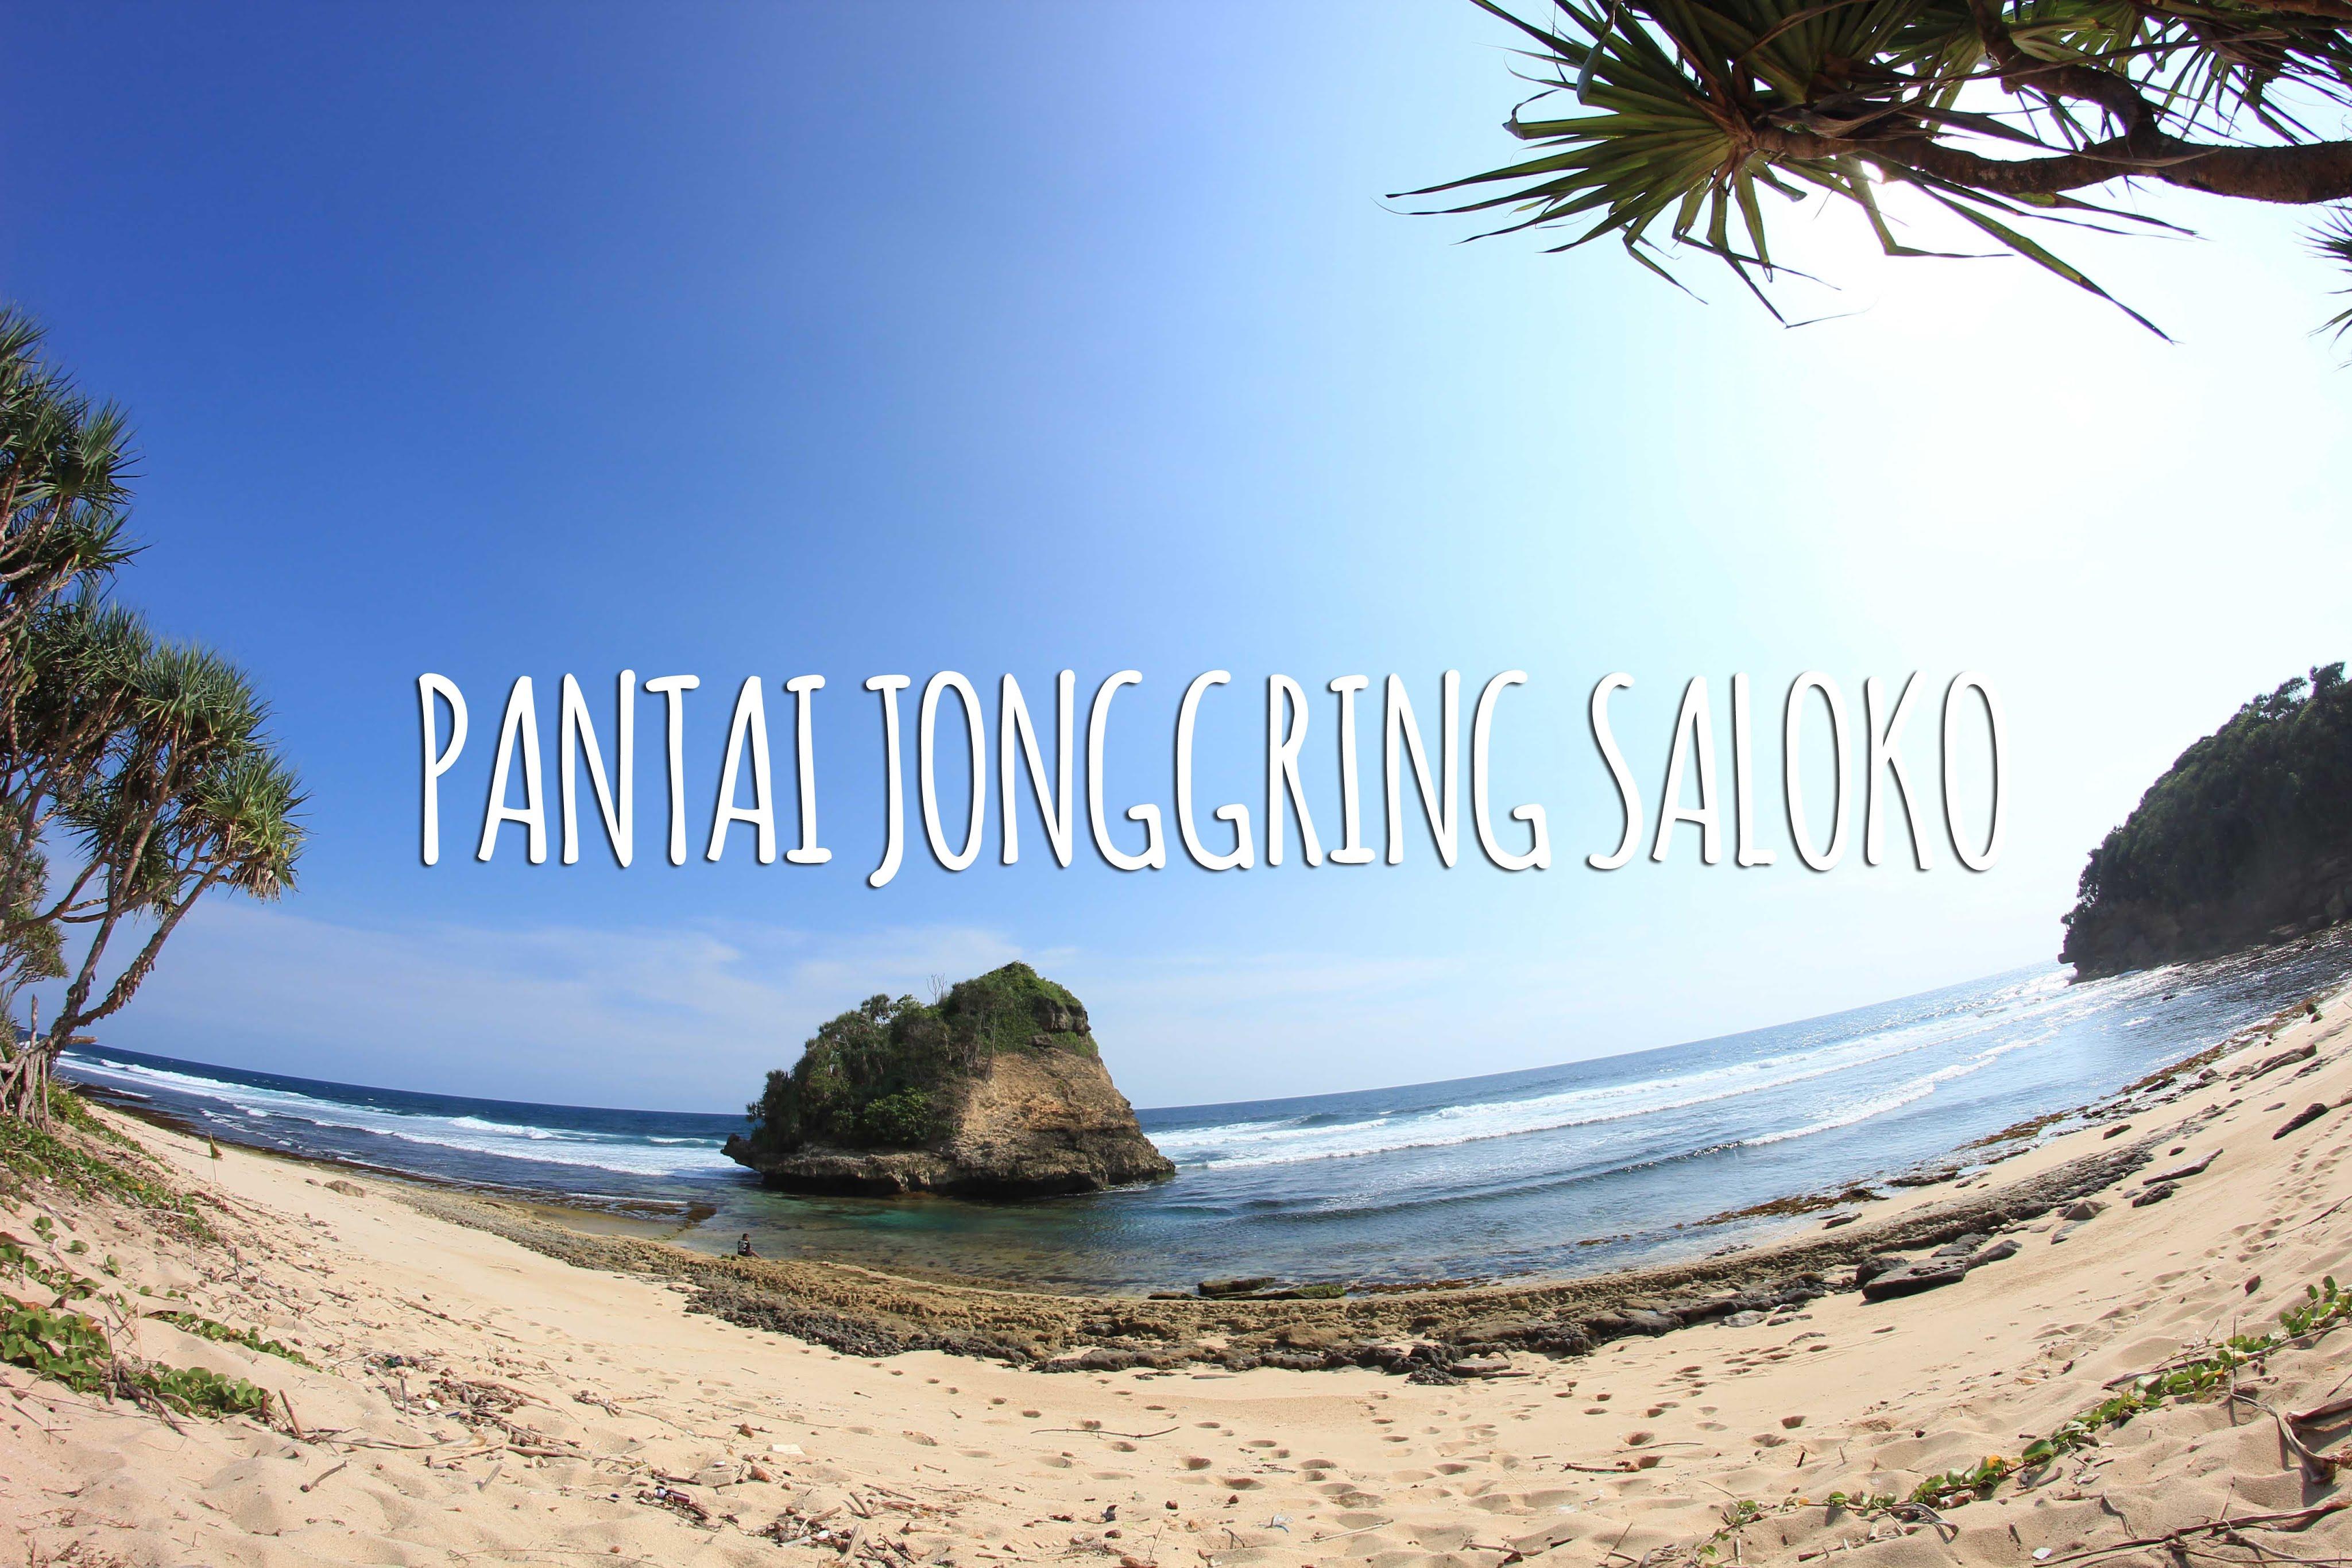 Pantai Jonggring Saloko Kabupaten Malang Jawa Timur Indonesia Youtube Kab